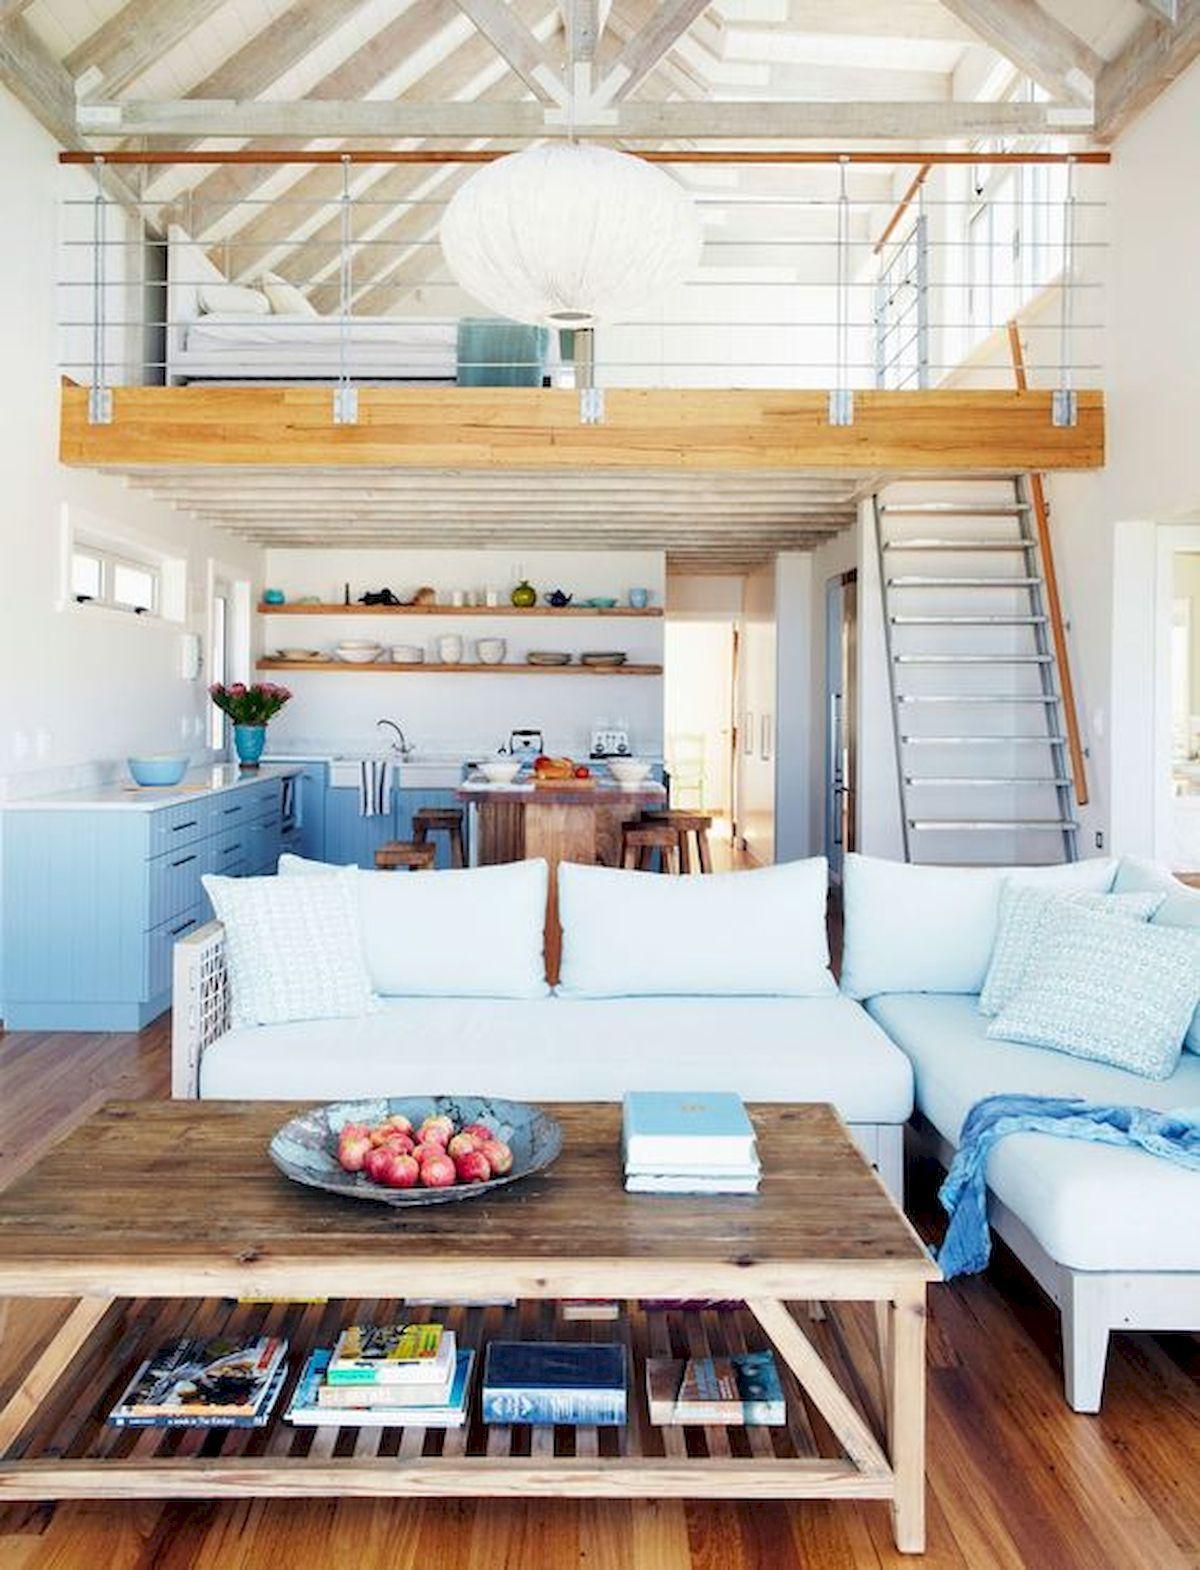 Awesome best dream rooms design ideas https worldecor also algunas casas bellas kireei cosas dwell house rh pinterest